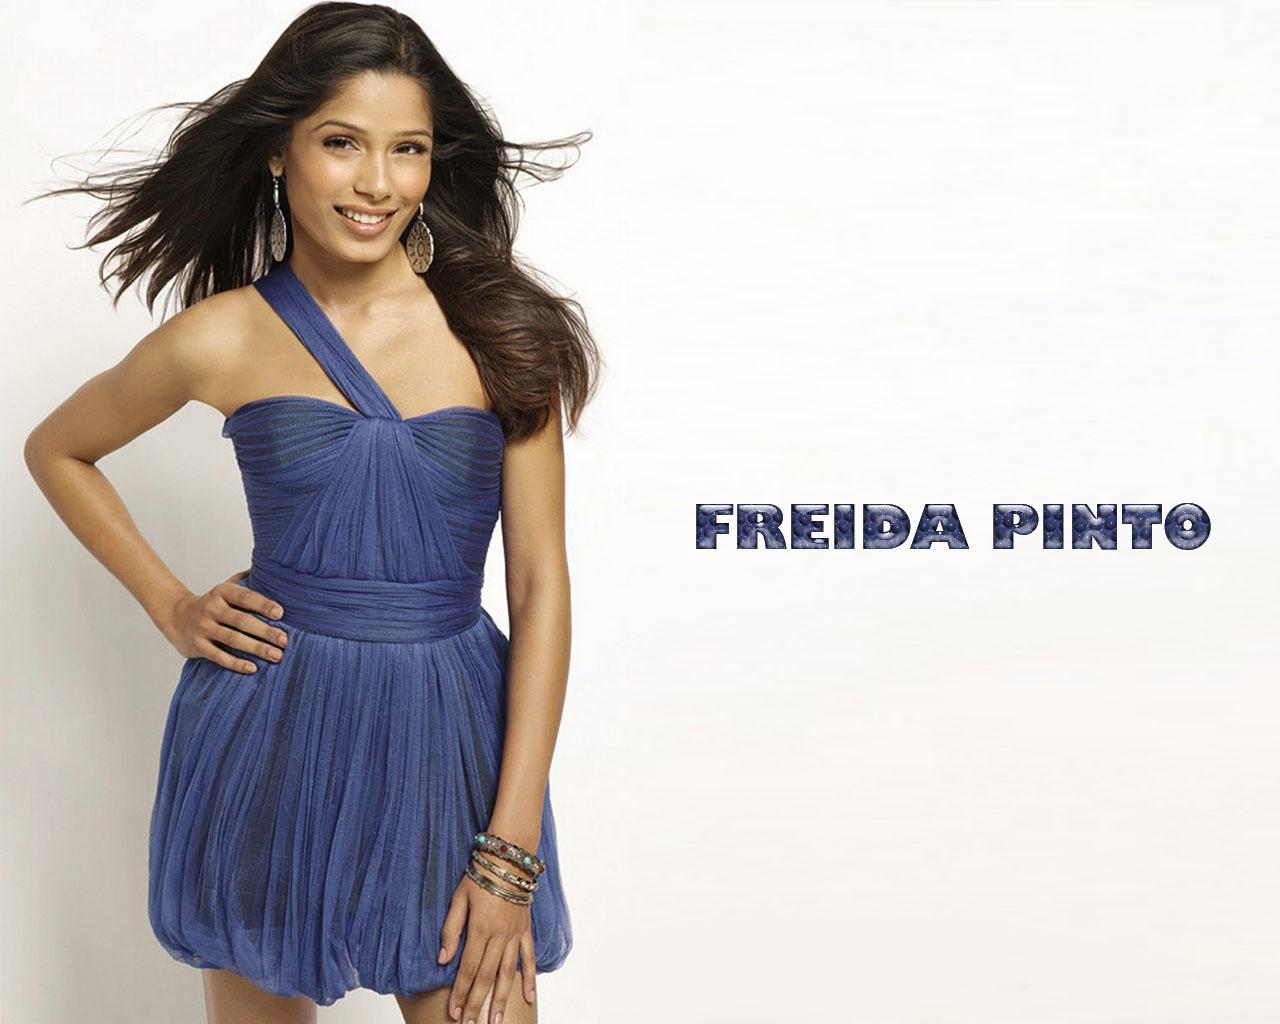 http://4.bp.blogspot.com/_TiCO8op_NpI/TEK08uyhAEI/AAAAAAAAQ0Q/_sqDD7qJWe0/s1600/Freida+Pinto.jpg+%2810%29.jpg